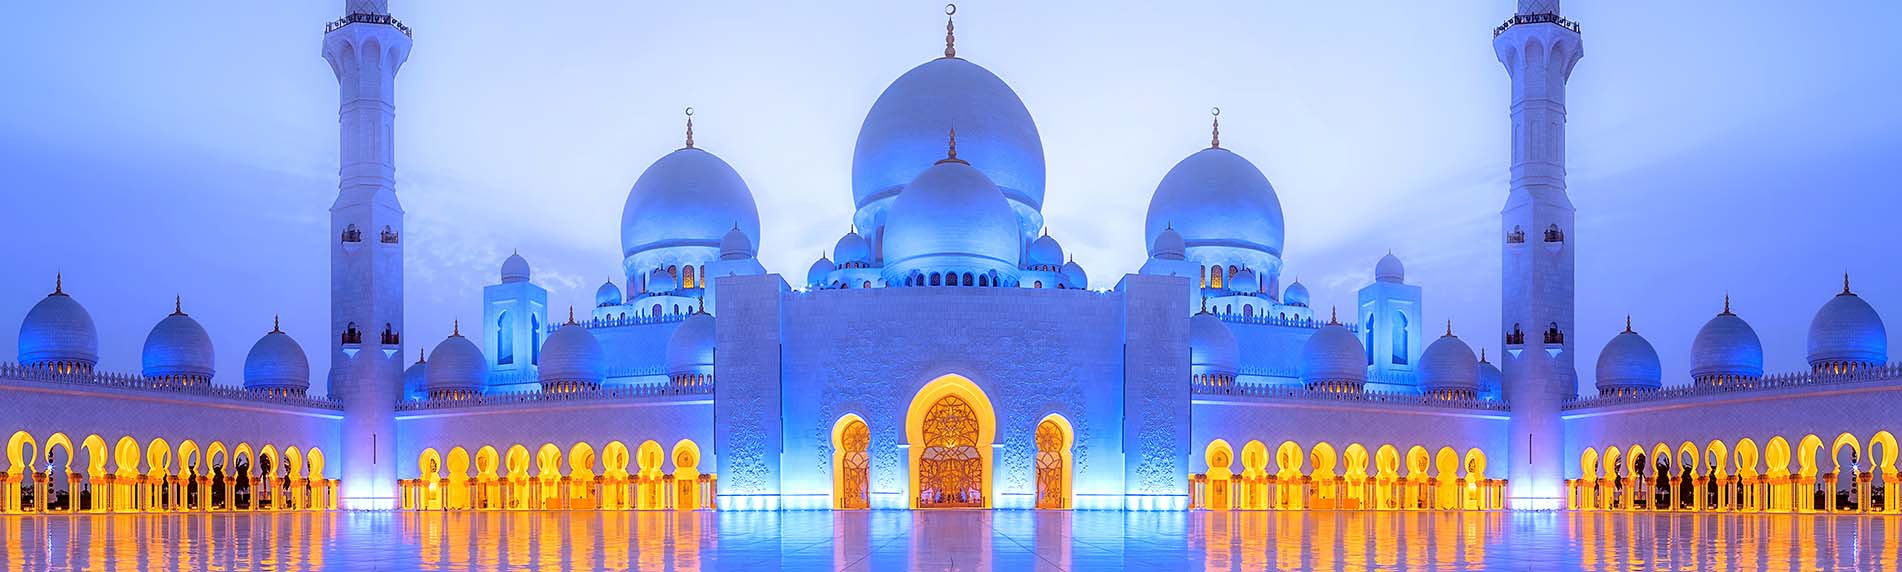 sheikh-zayed-mosque-abudhabi